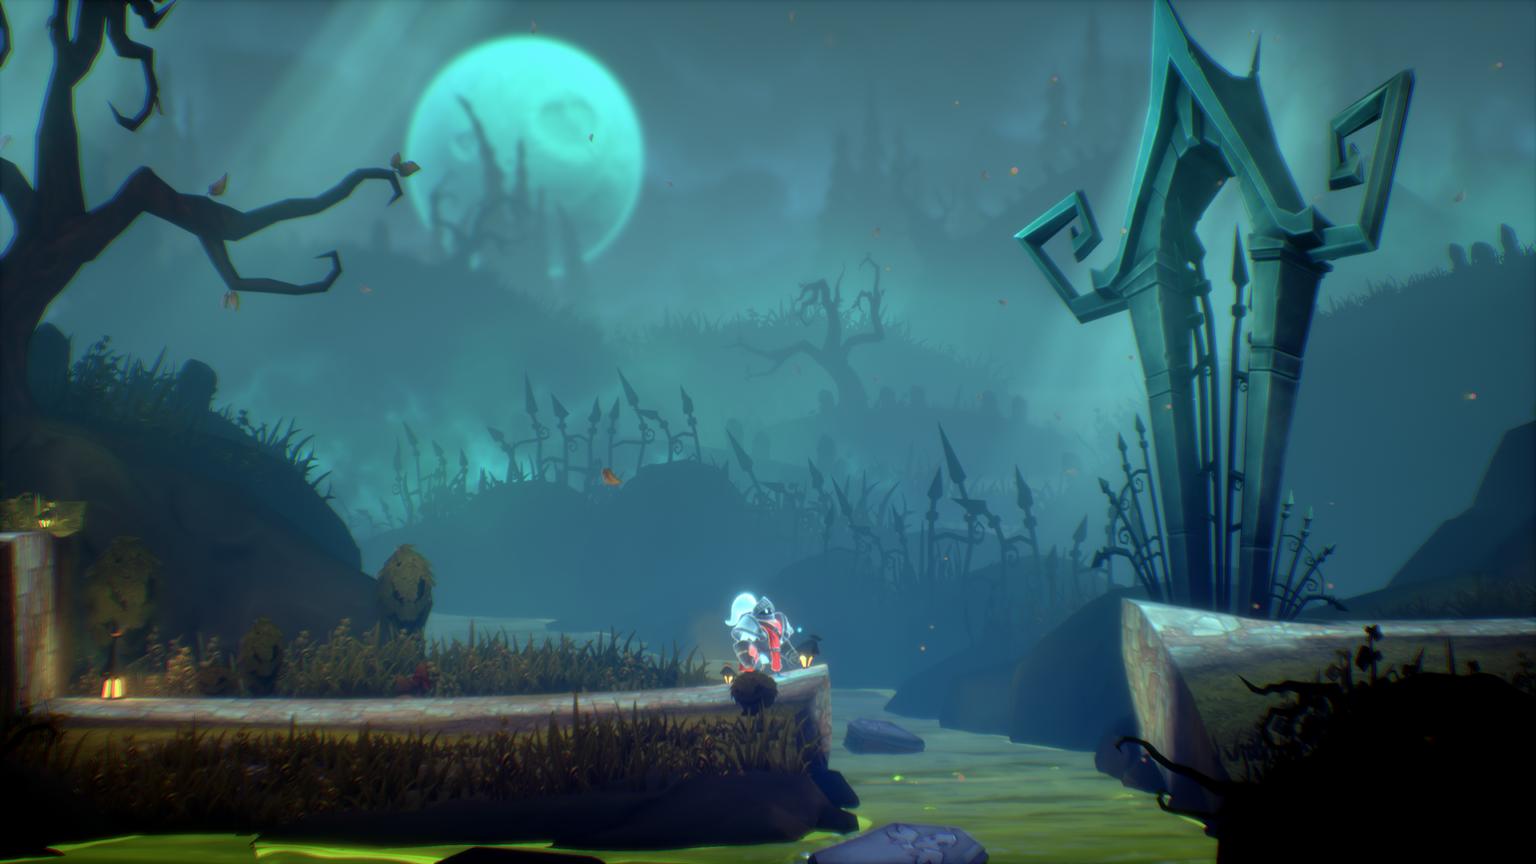 Анонсирован мультяшный экшен-платформер Ghost Knight: A Dark Tale